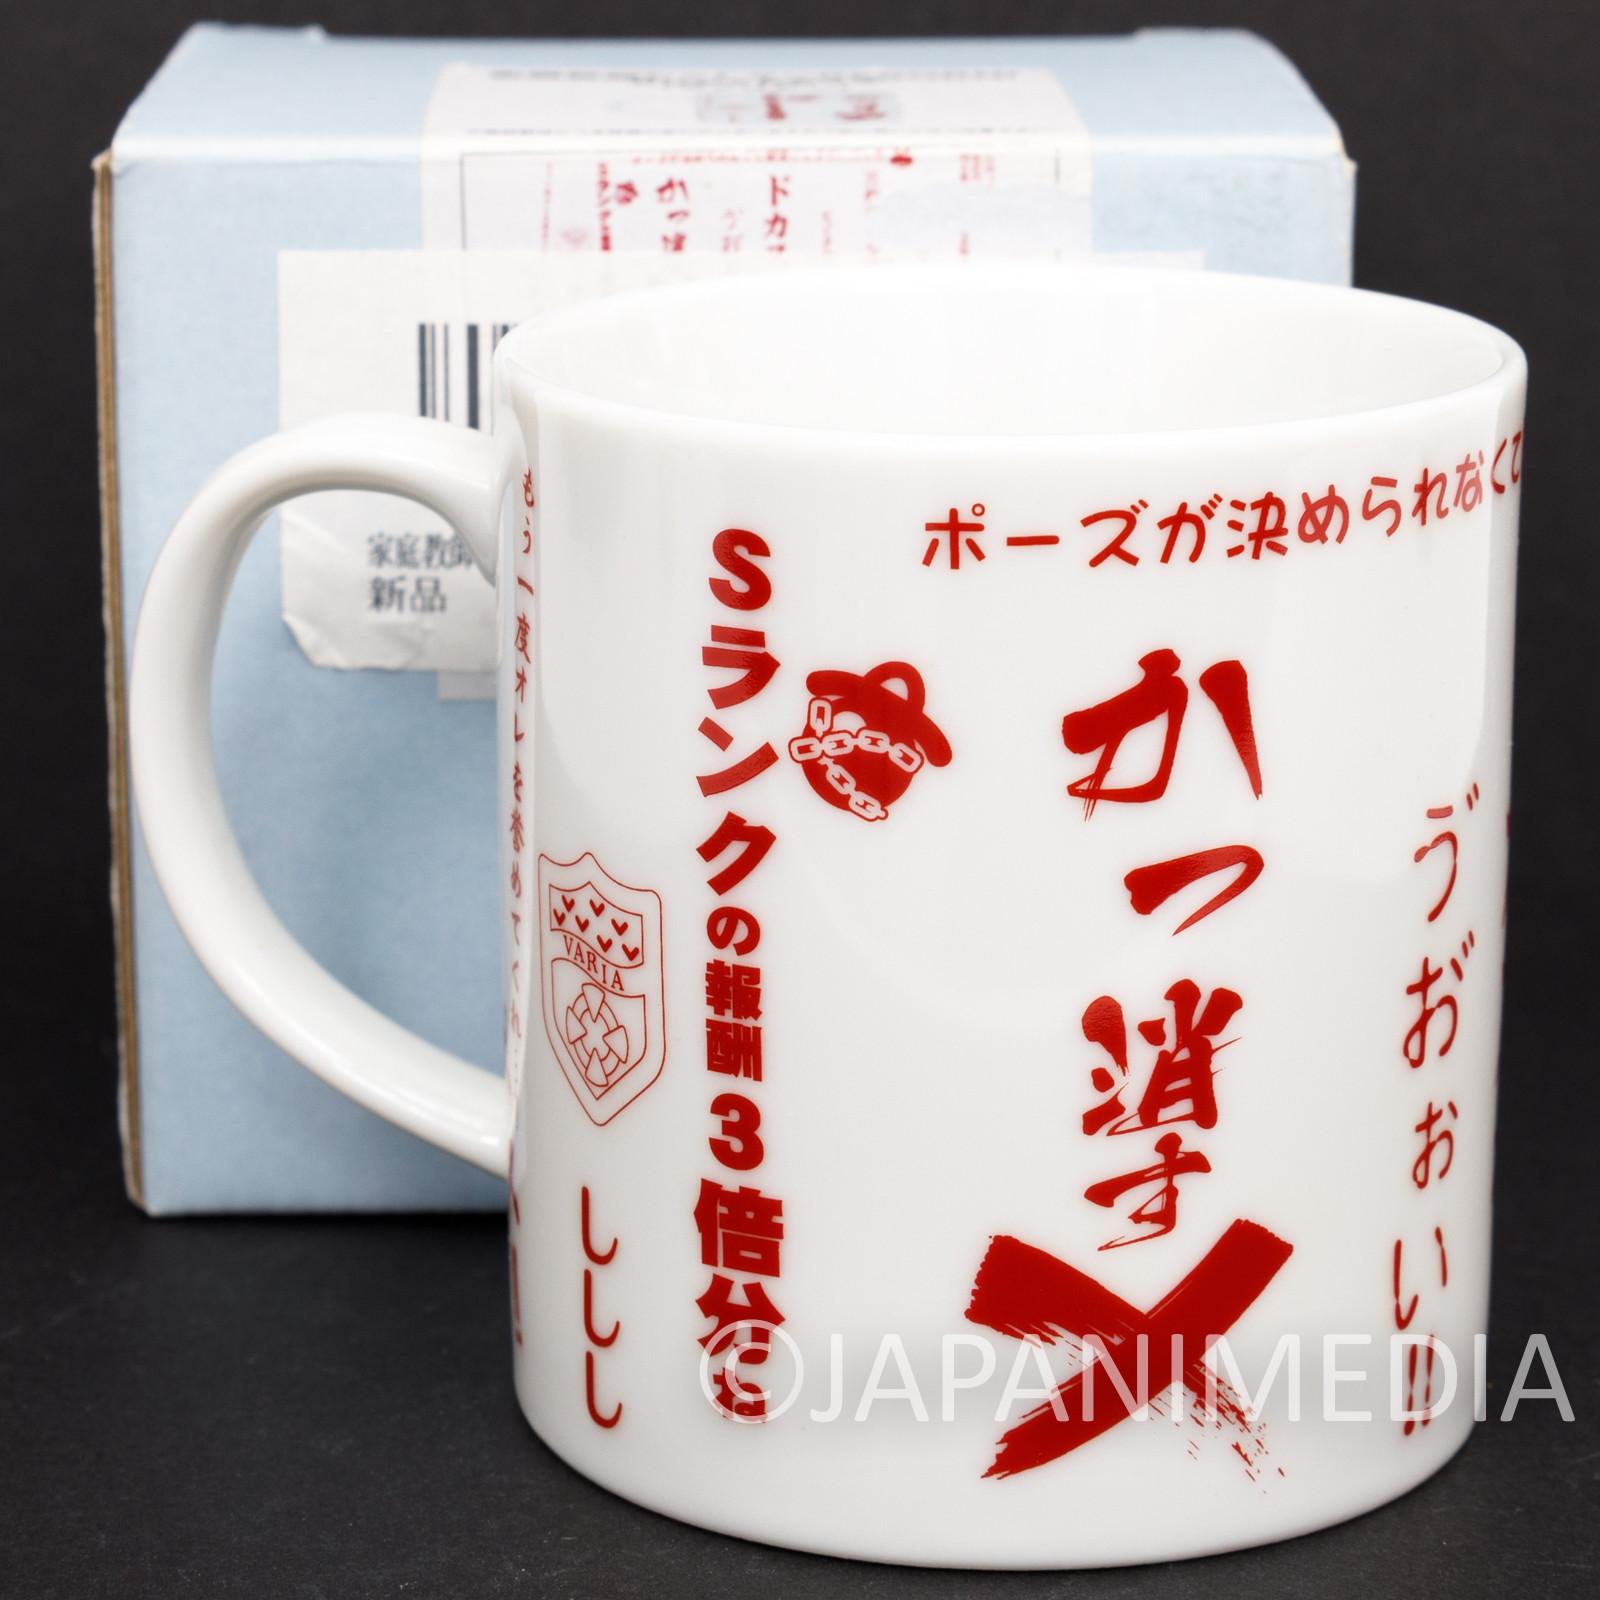 Katekyo Hitman REBORN! Mug VARIA Charactere's line Dialogue JAPAN SHONEN JUMP